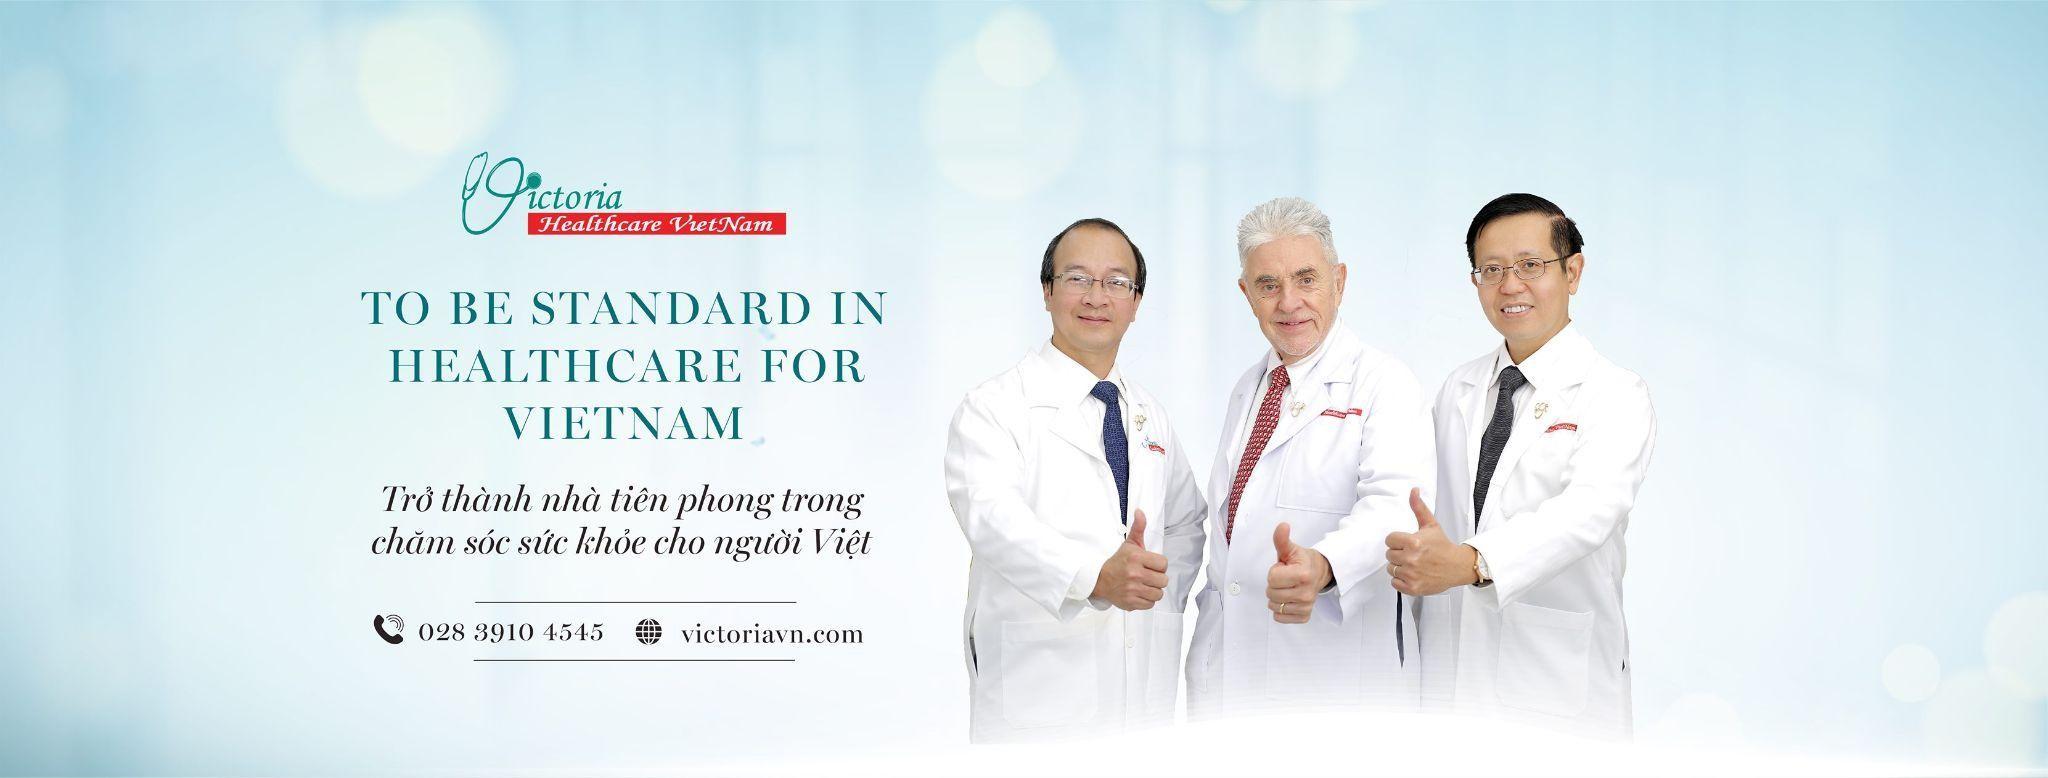 Victoria Healthcare (VHC)